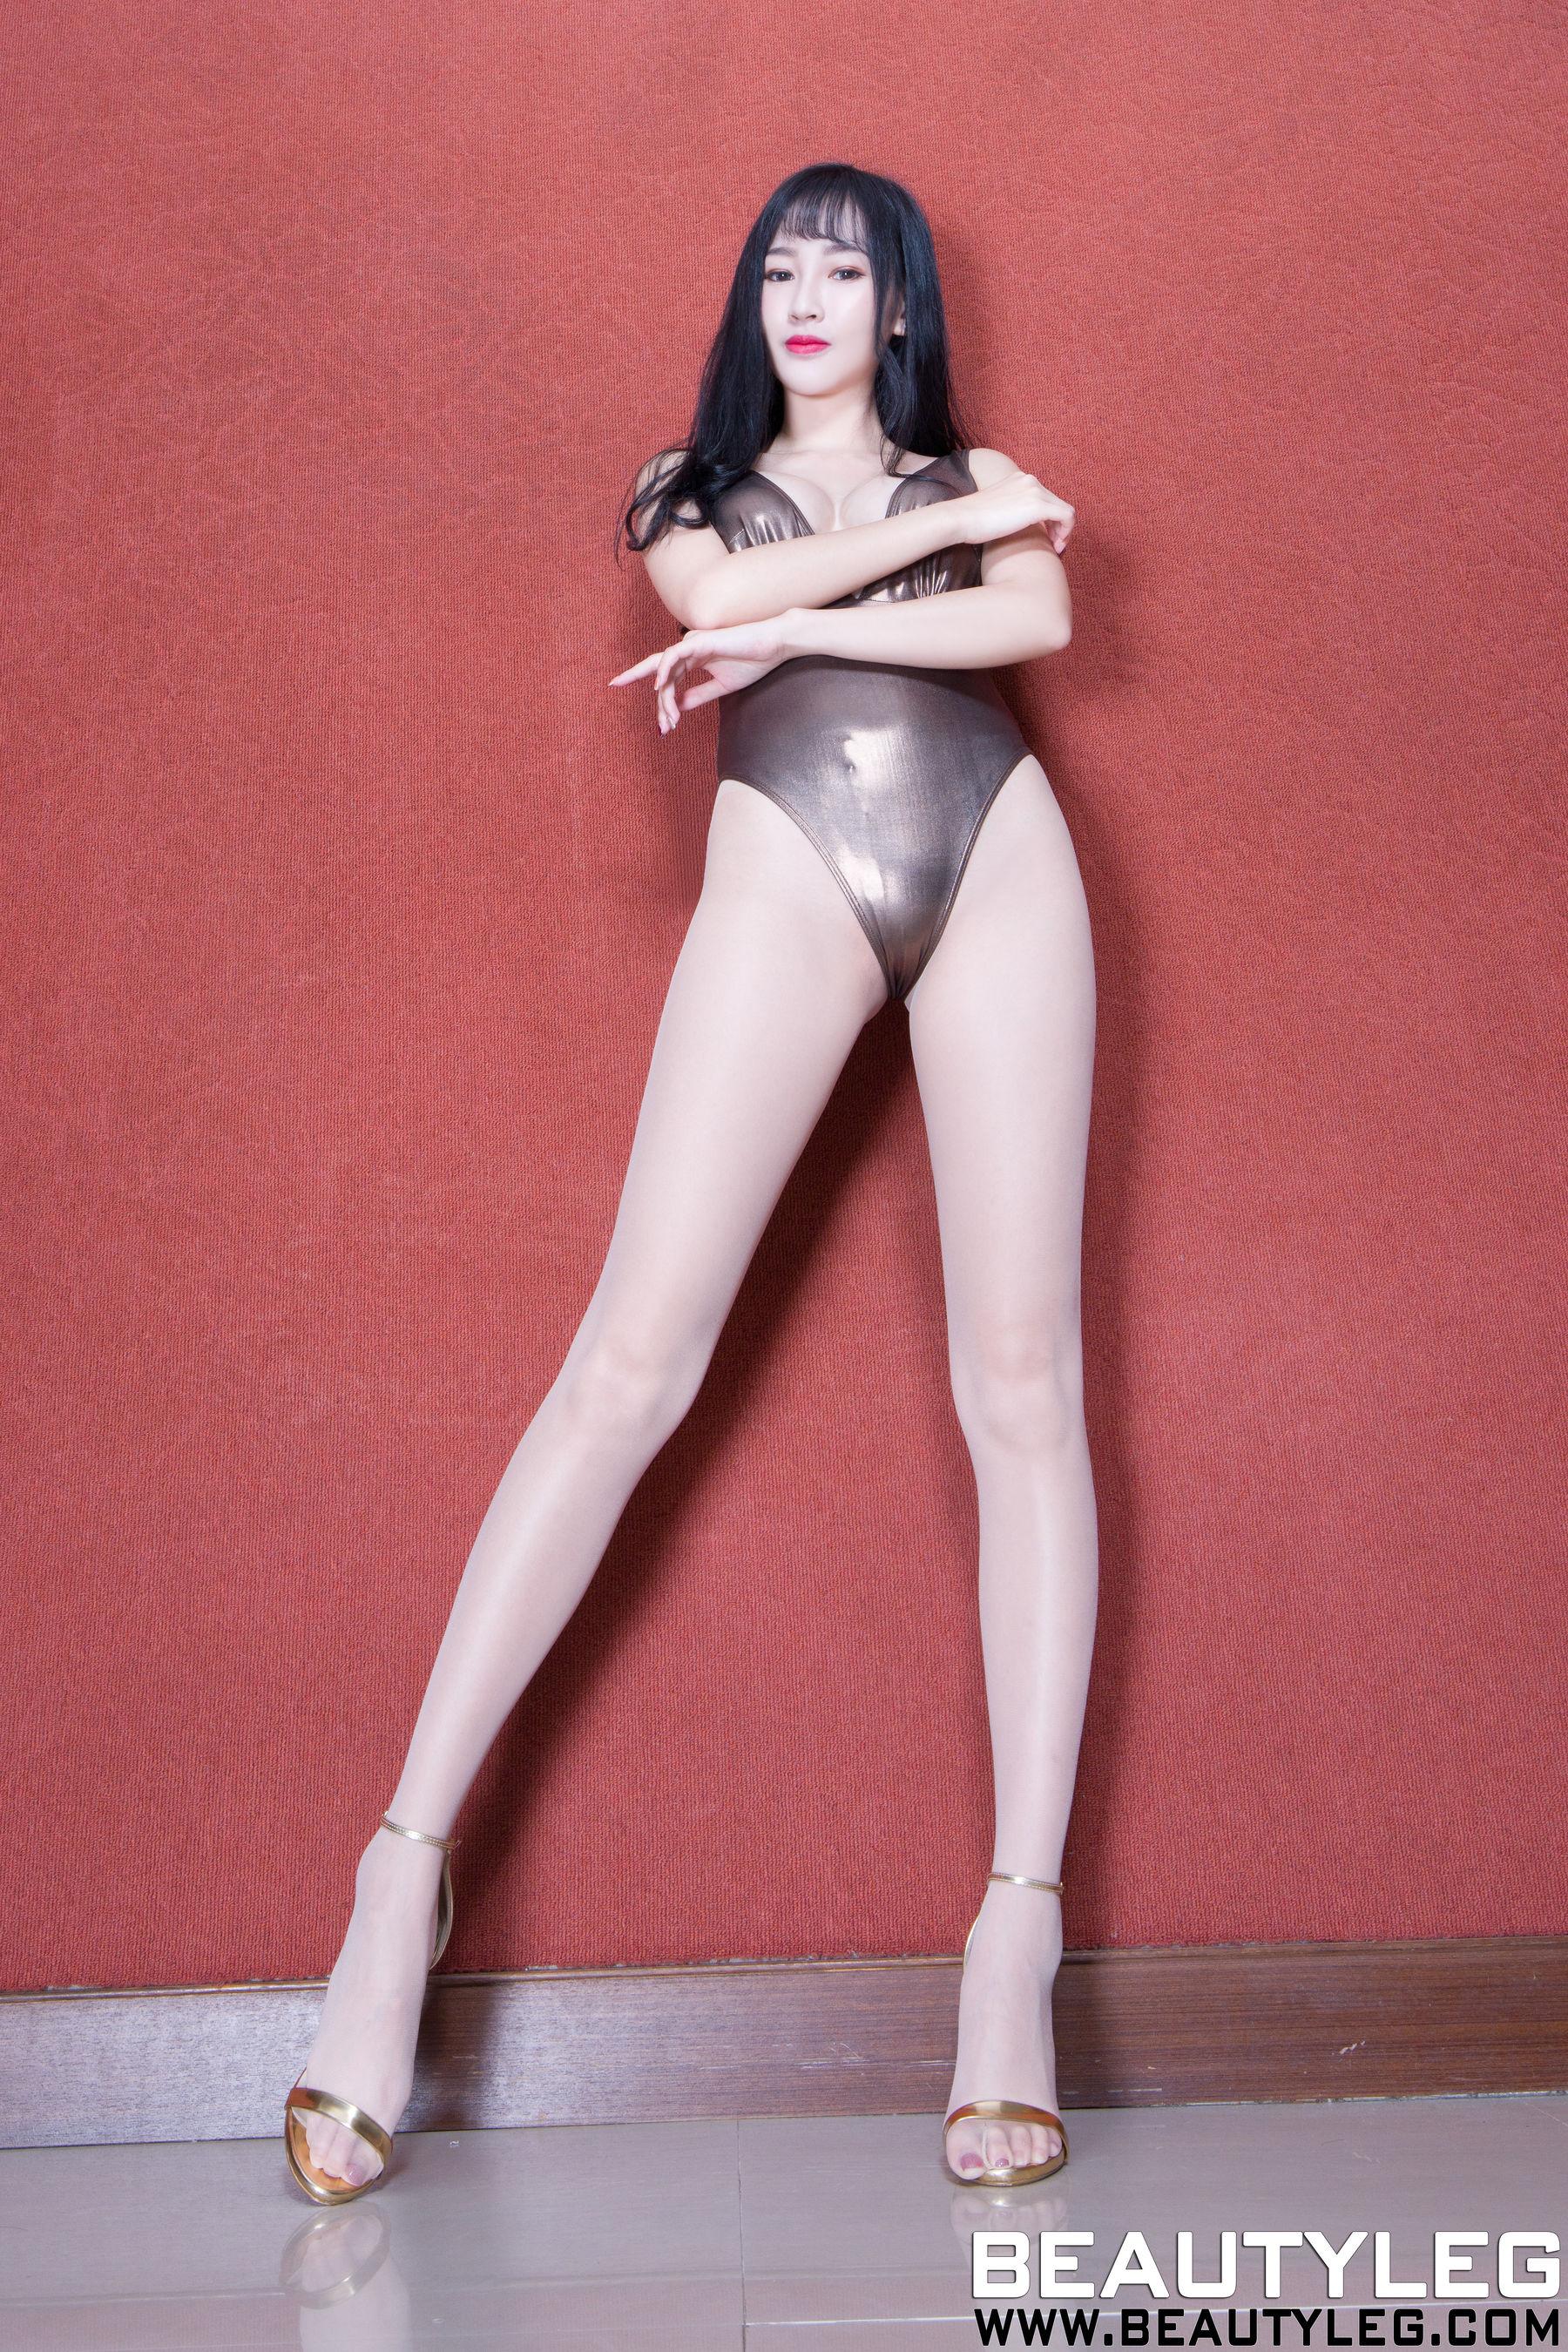 VOL.819 [Beautyleg]丝袜美腿高跟肉丝袜:腿模ChiChi超高清个人性感漂亮大图(55P)